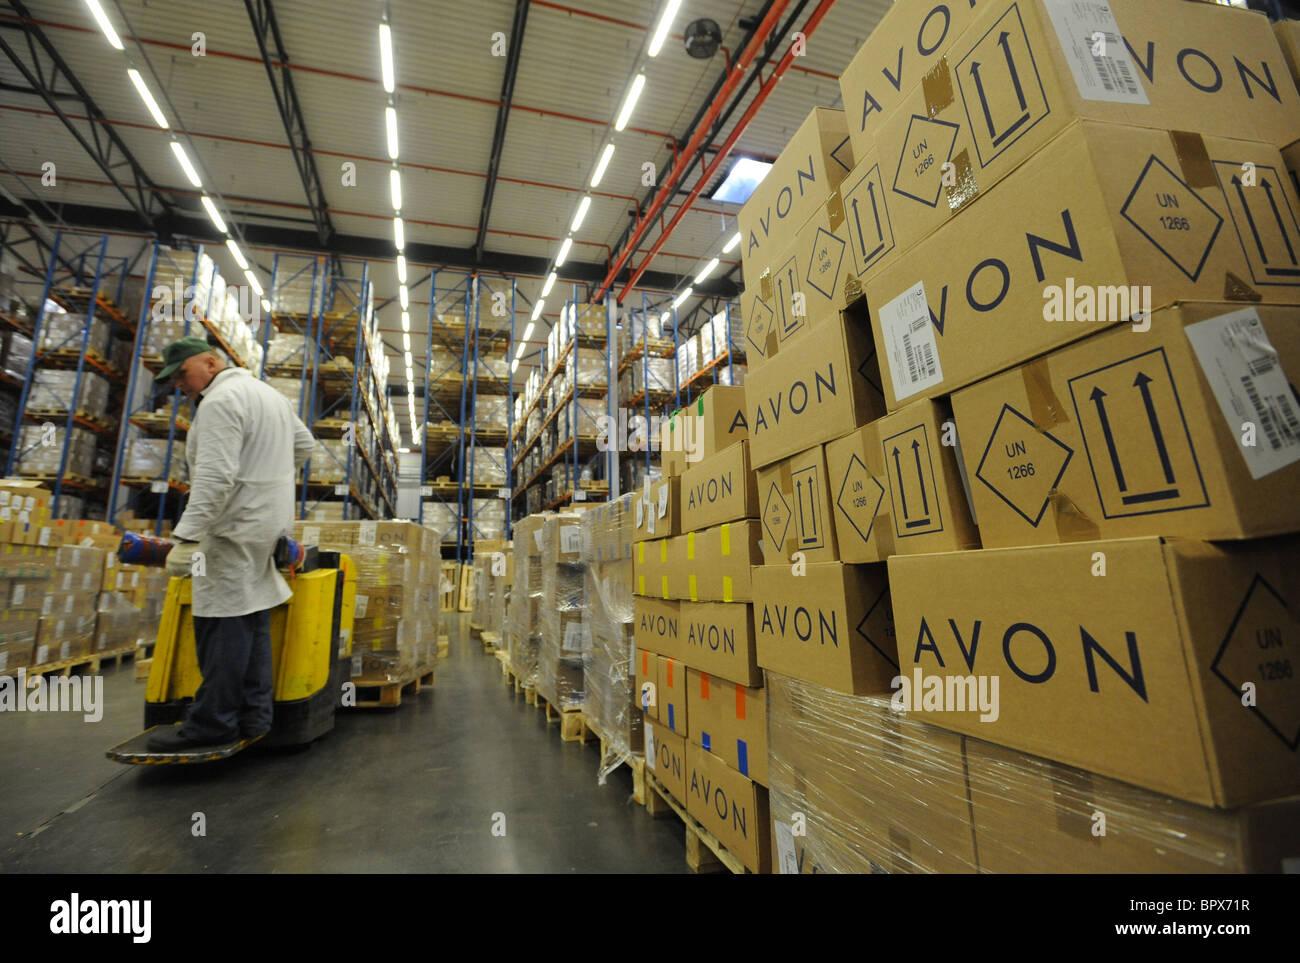 Stock Photo - Avon cosmetics manufacturing